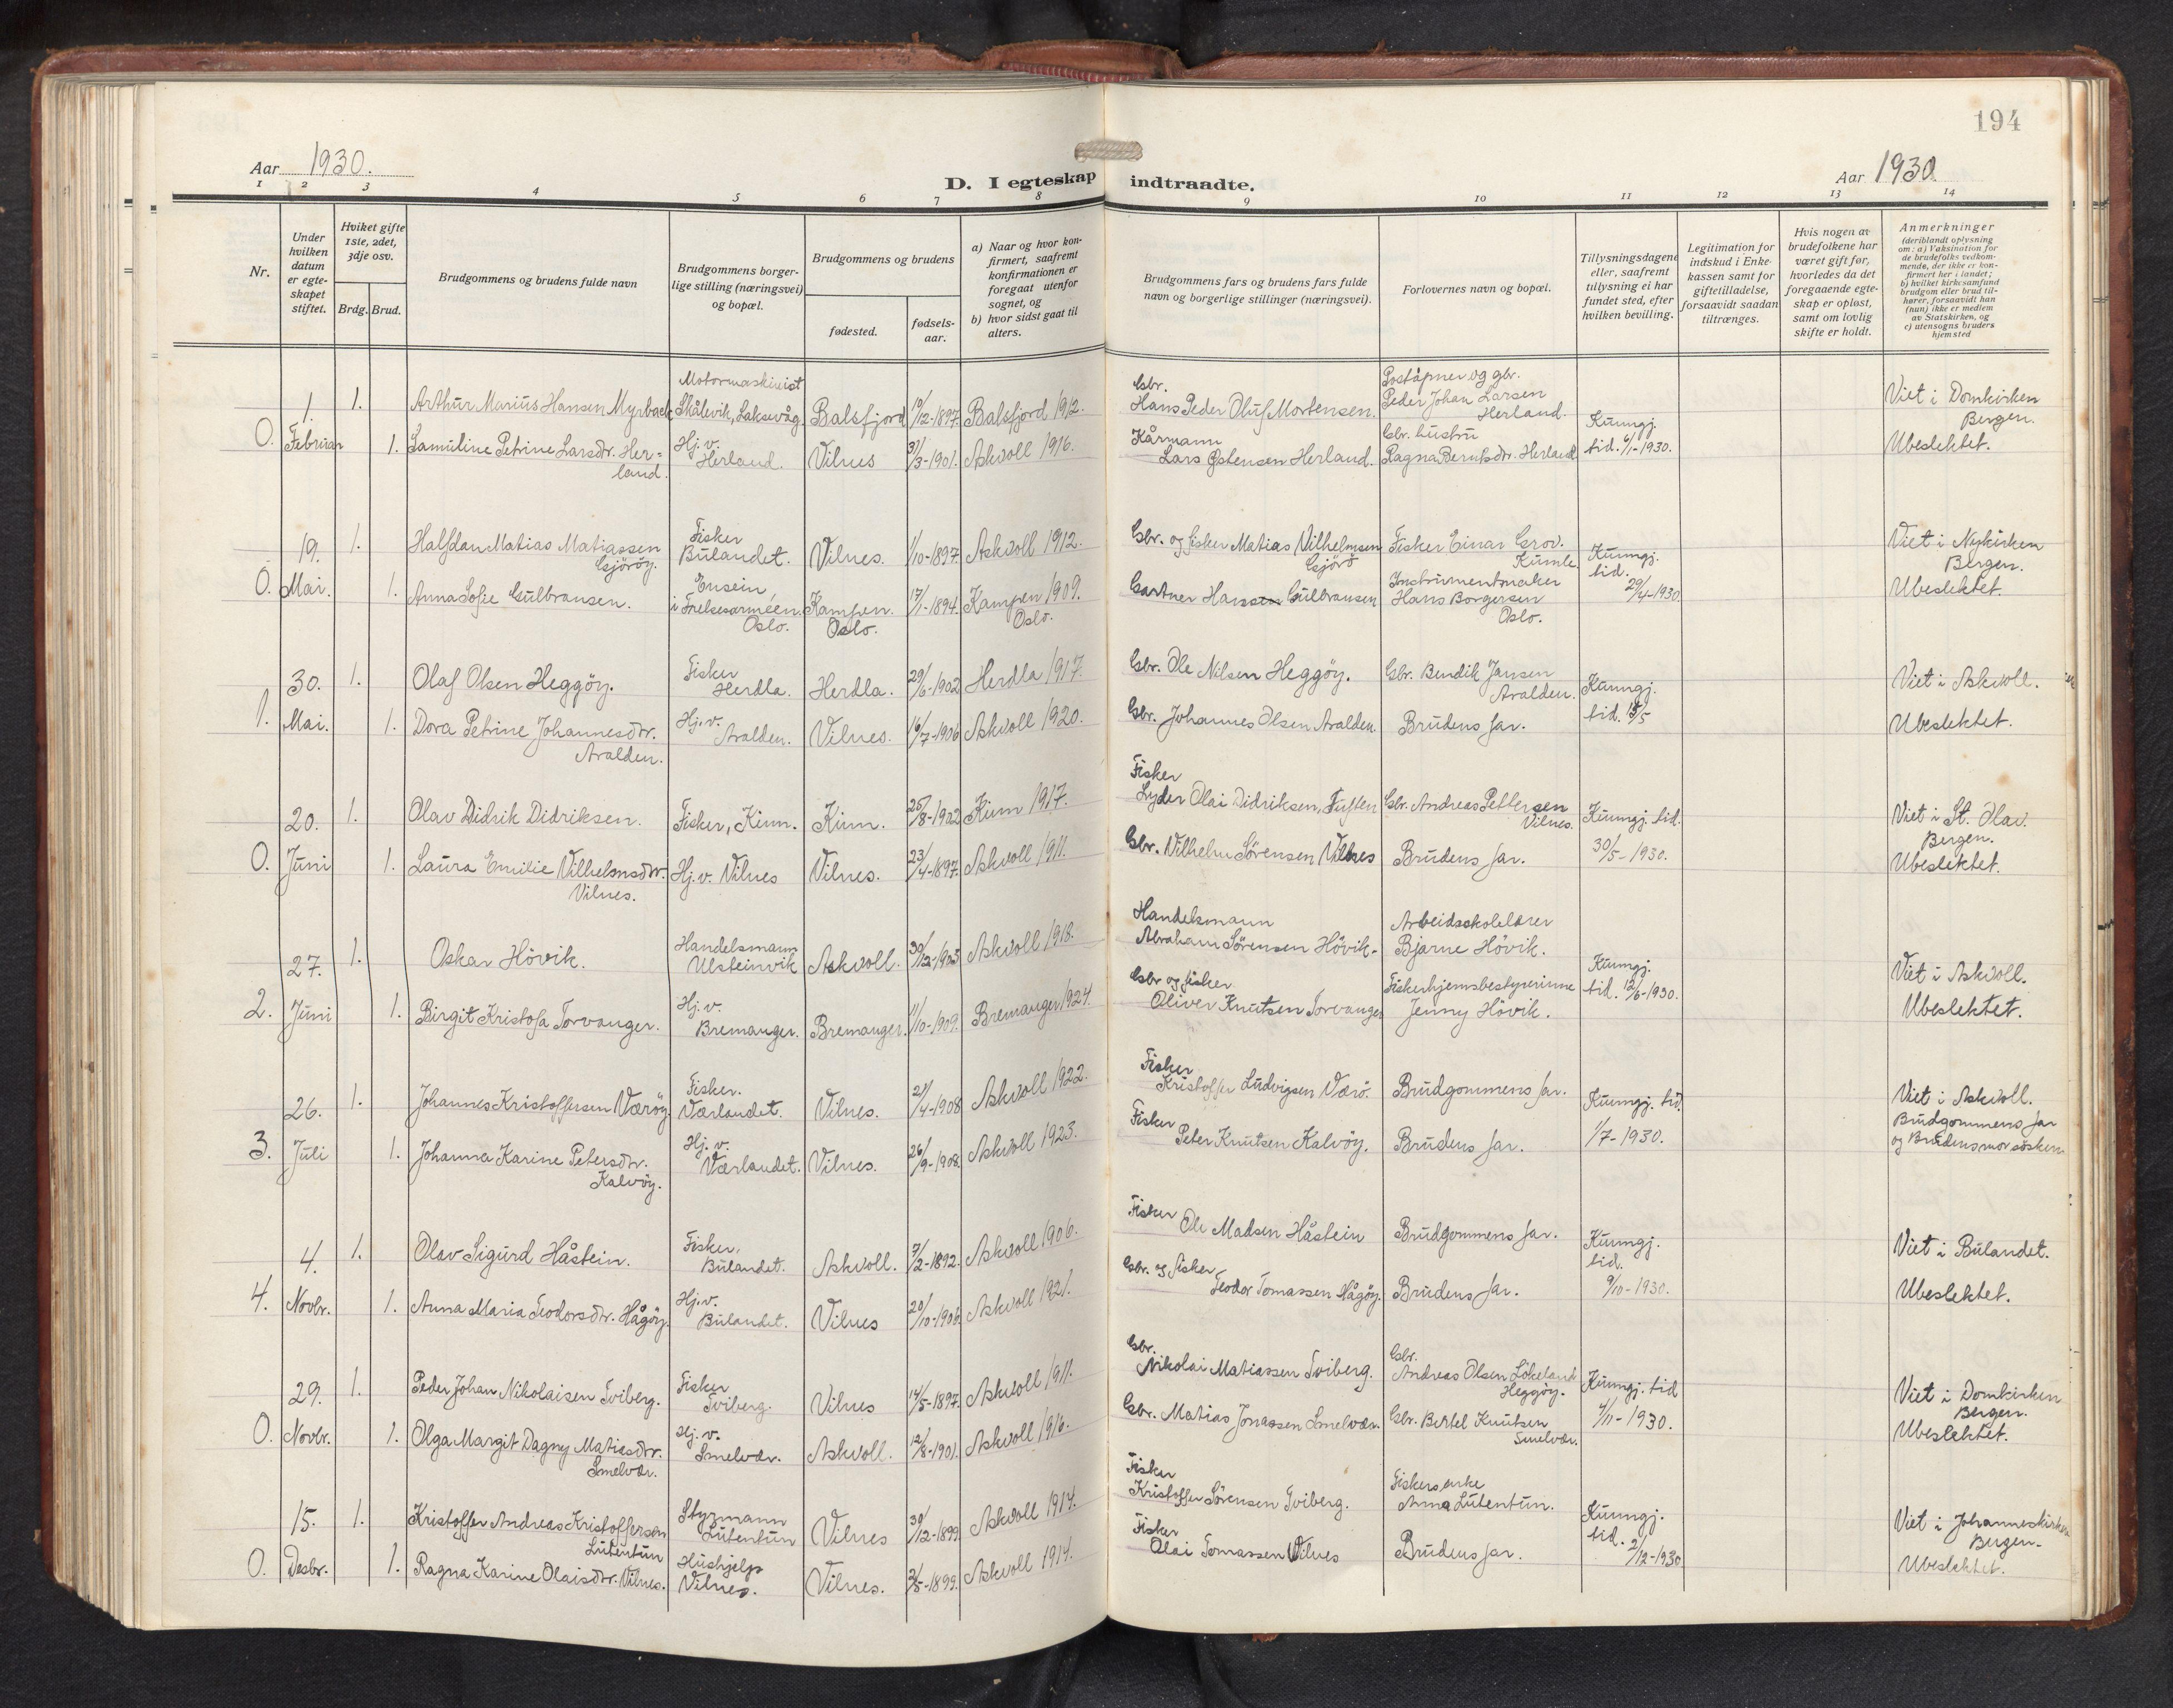 SAB, Askvoll sokneprestembete, H/Hab/Habb/L0002: Klokkerbok nr. B 2, 1910-1947, s. 193b-194a